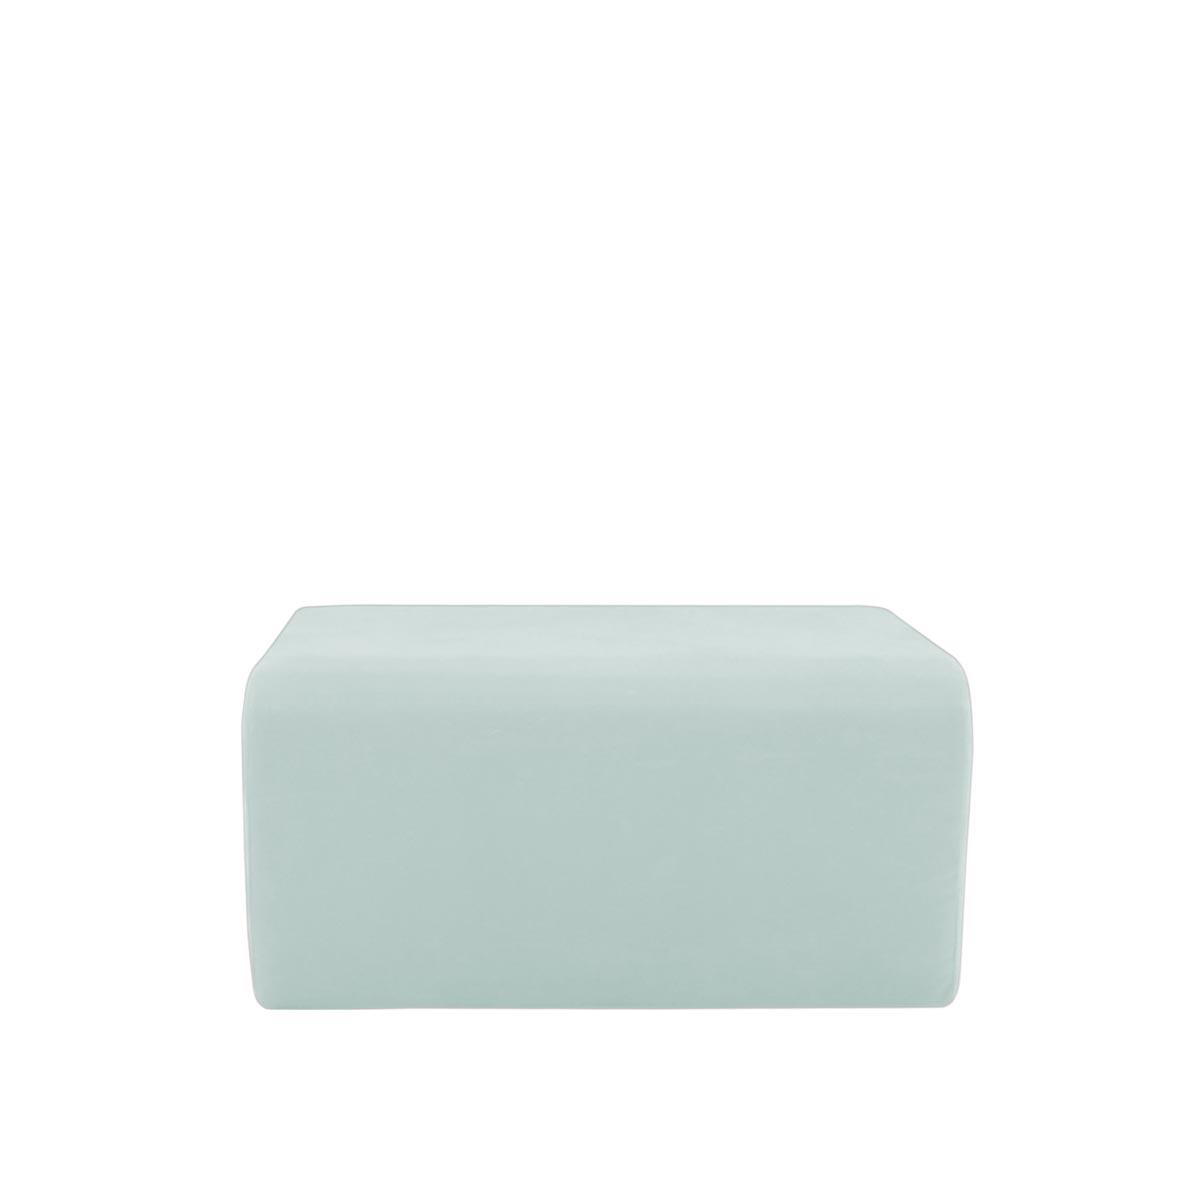 Pufe Muss R02 Tecido Lonita Ice 01